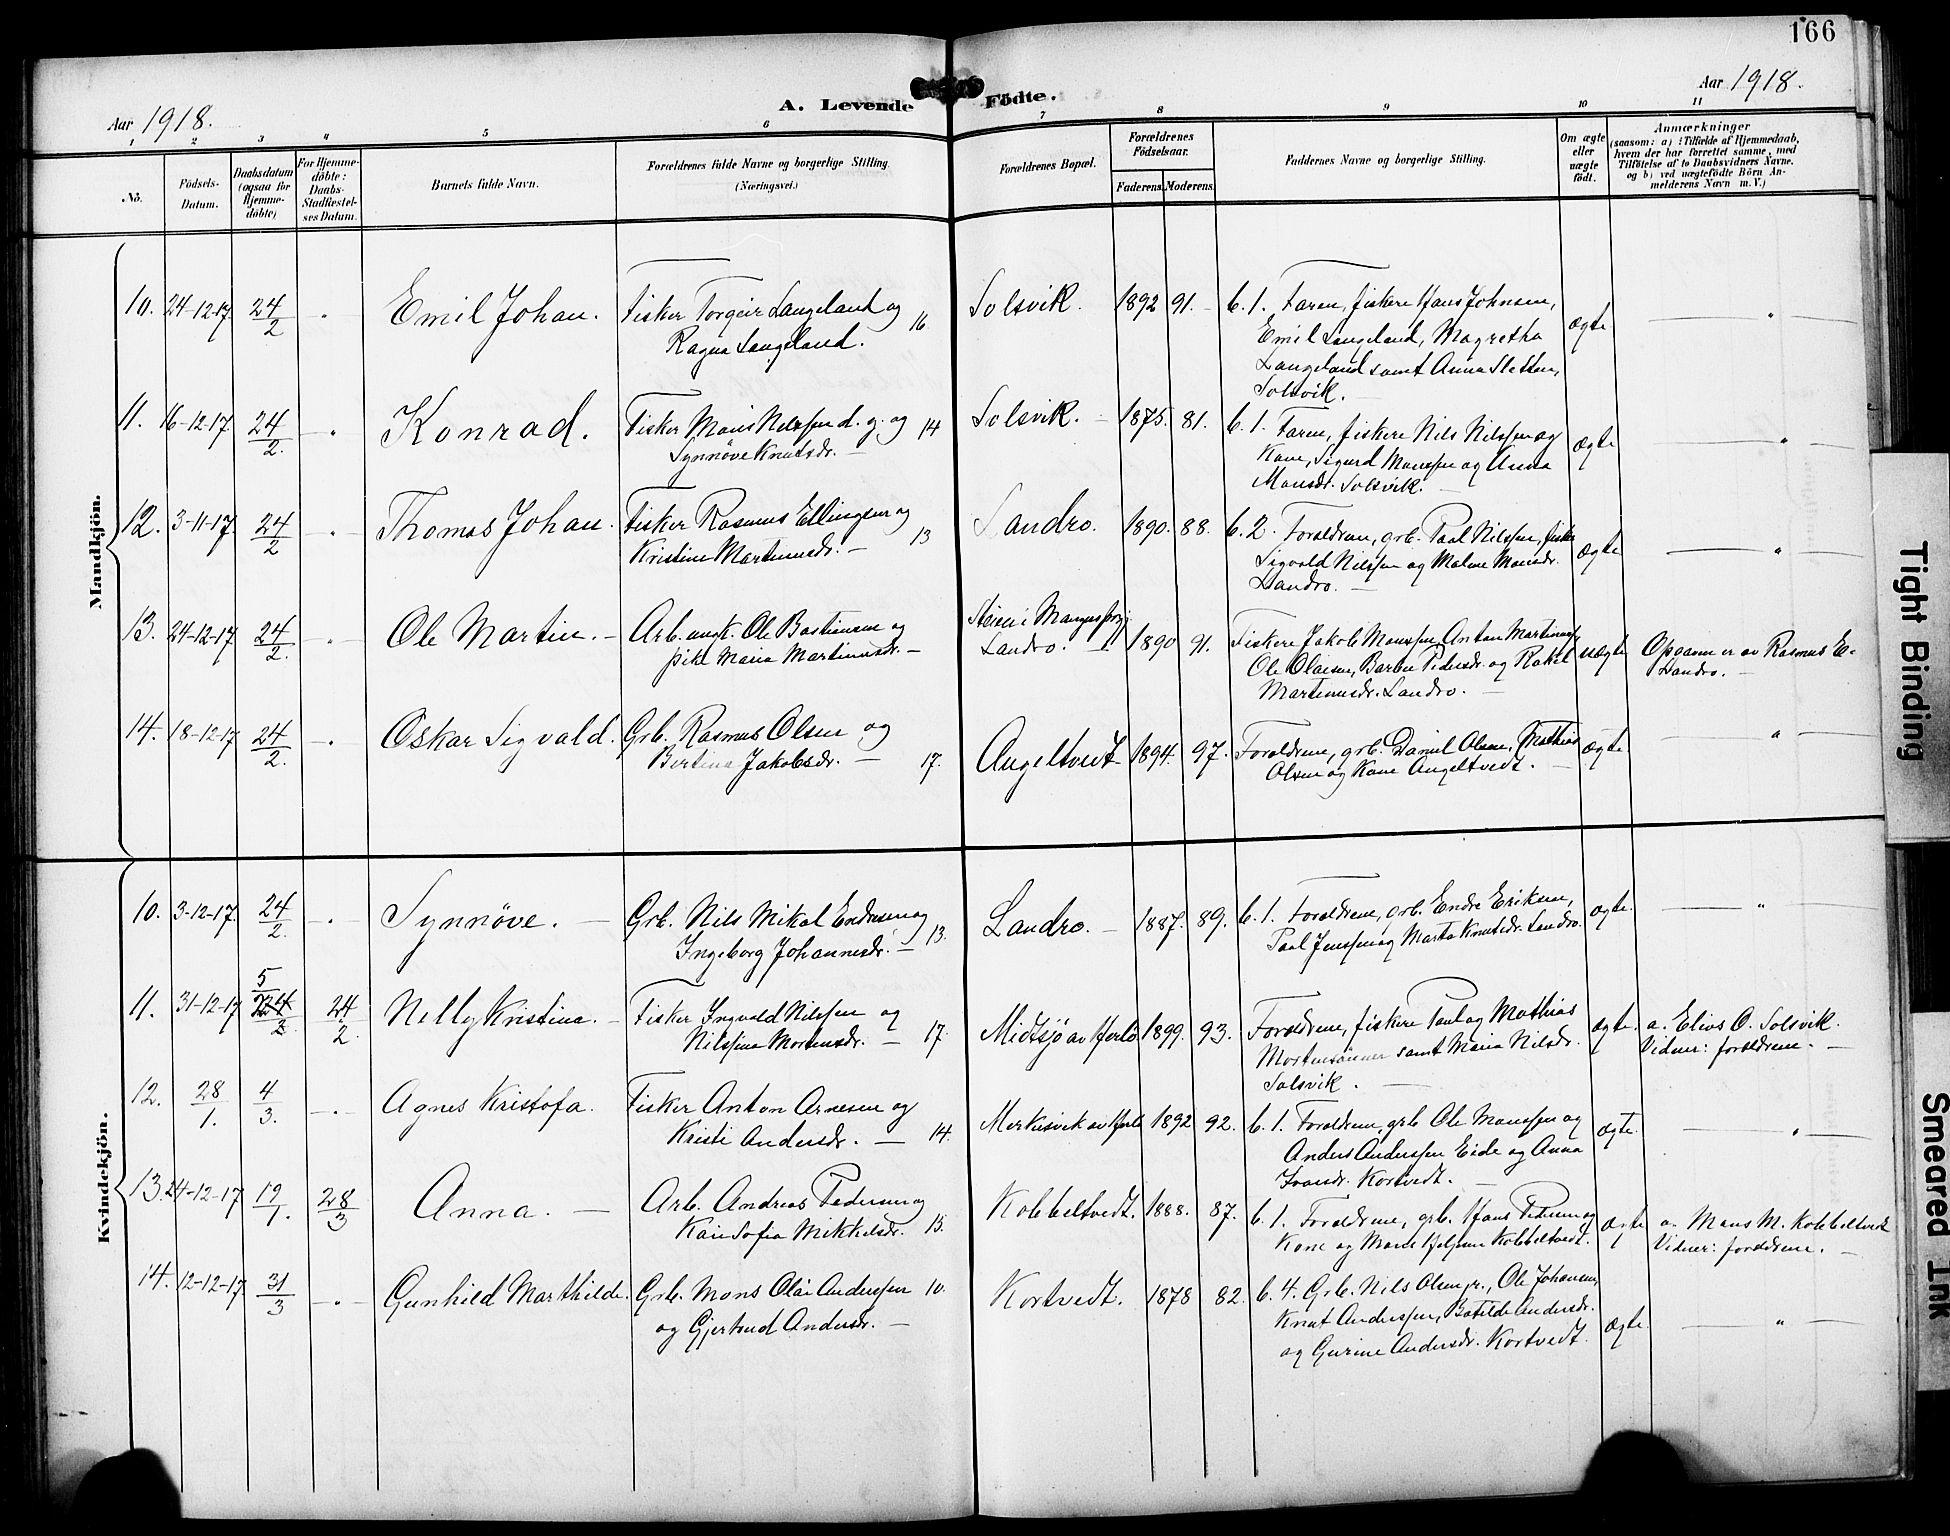 SAB, Fjell Sokneprestembete, H/Hab: Klokkerbok nr. A 5, 1899-1918, s. 166